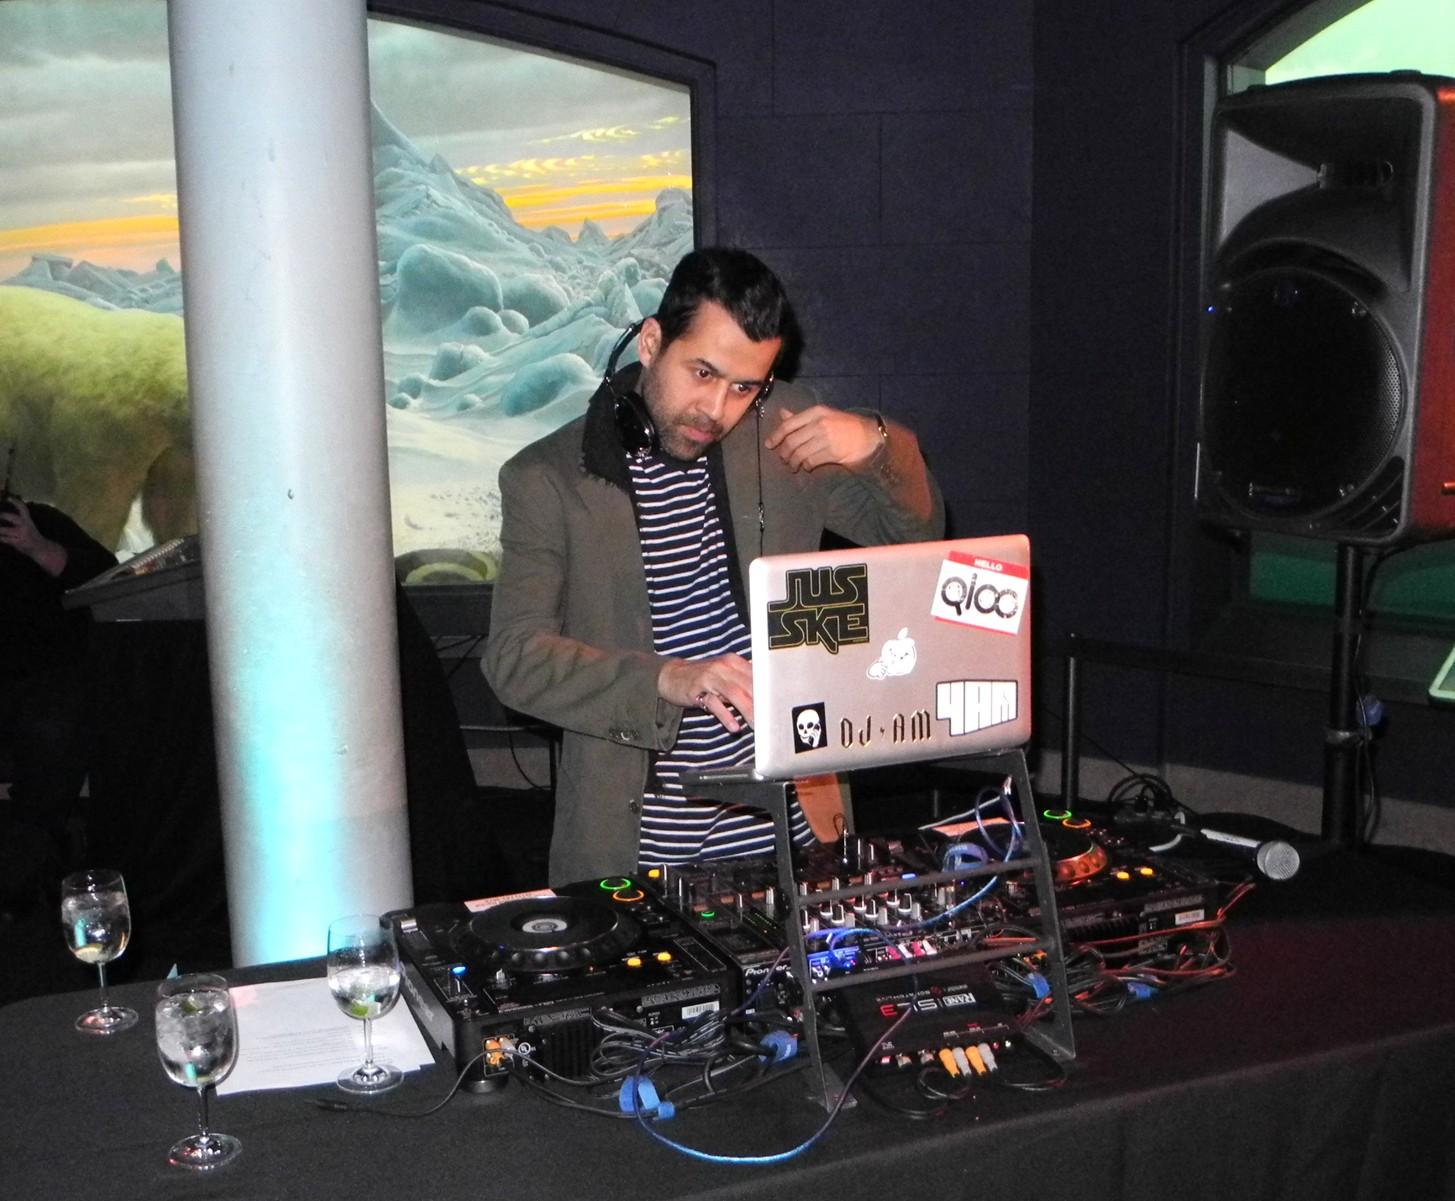 DJ Jus-Ske Under the Sea American Museum of Natural History